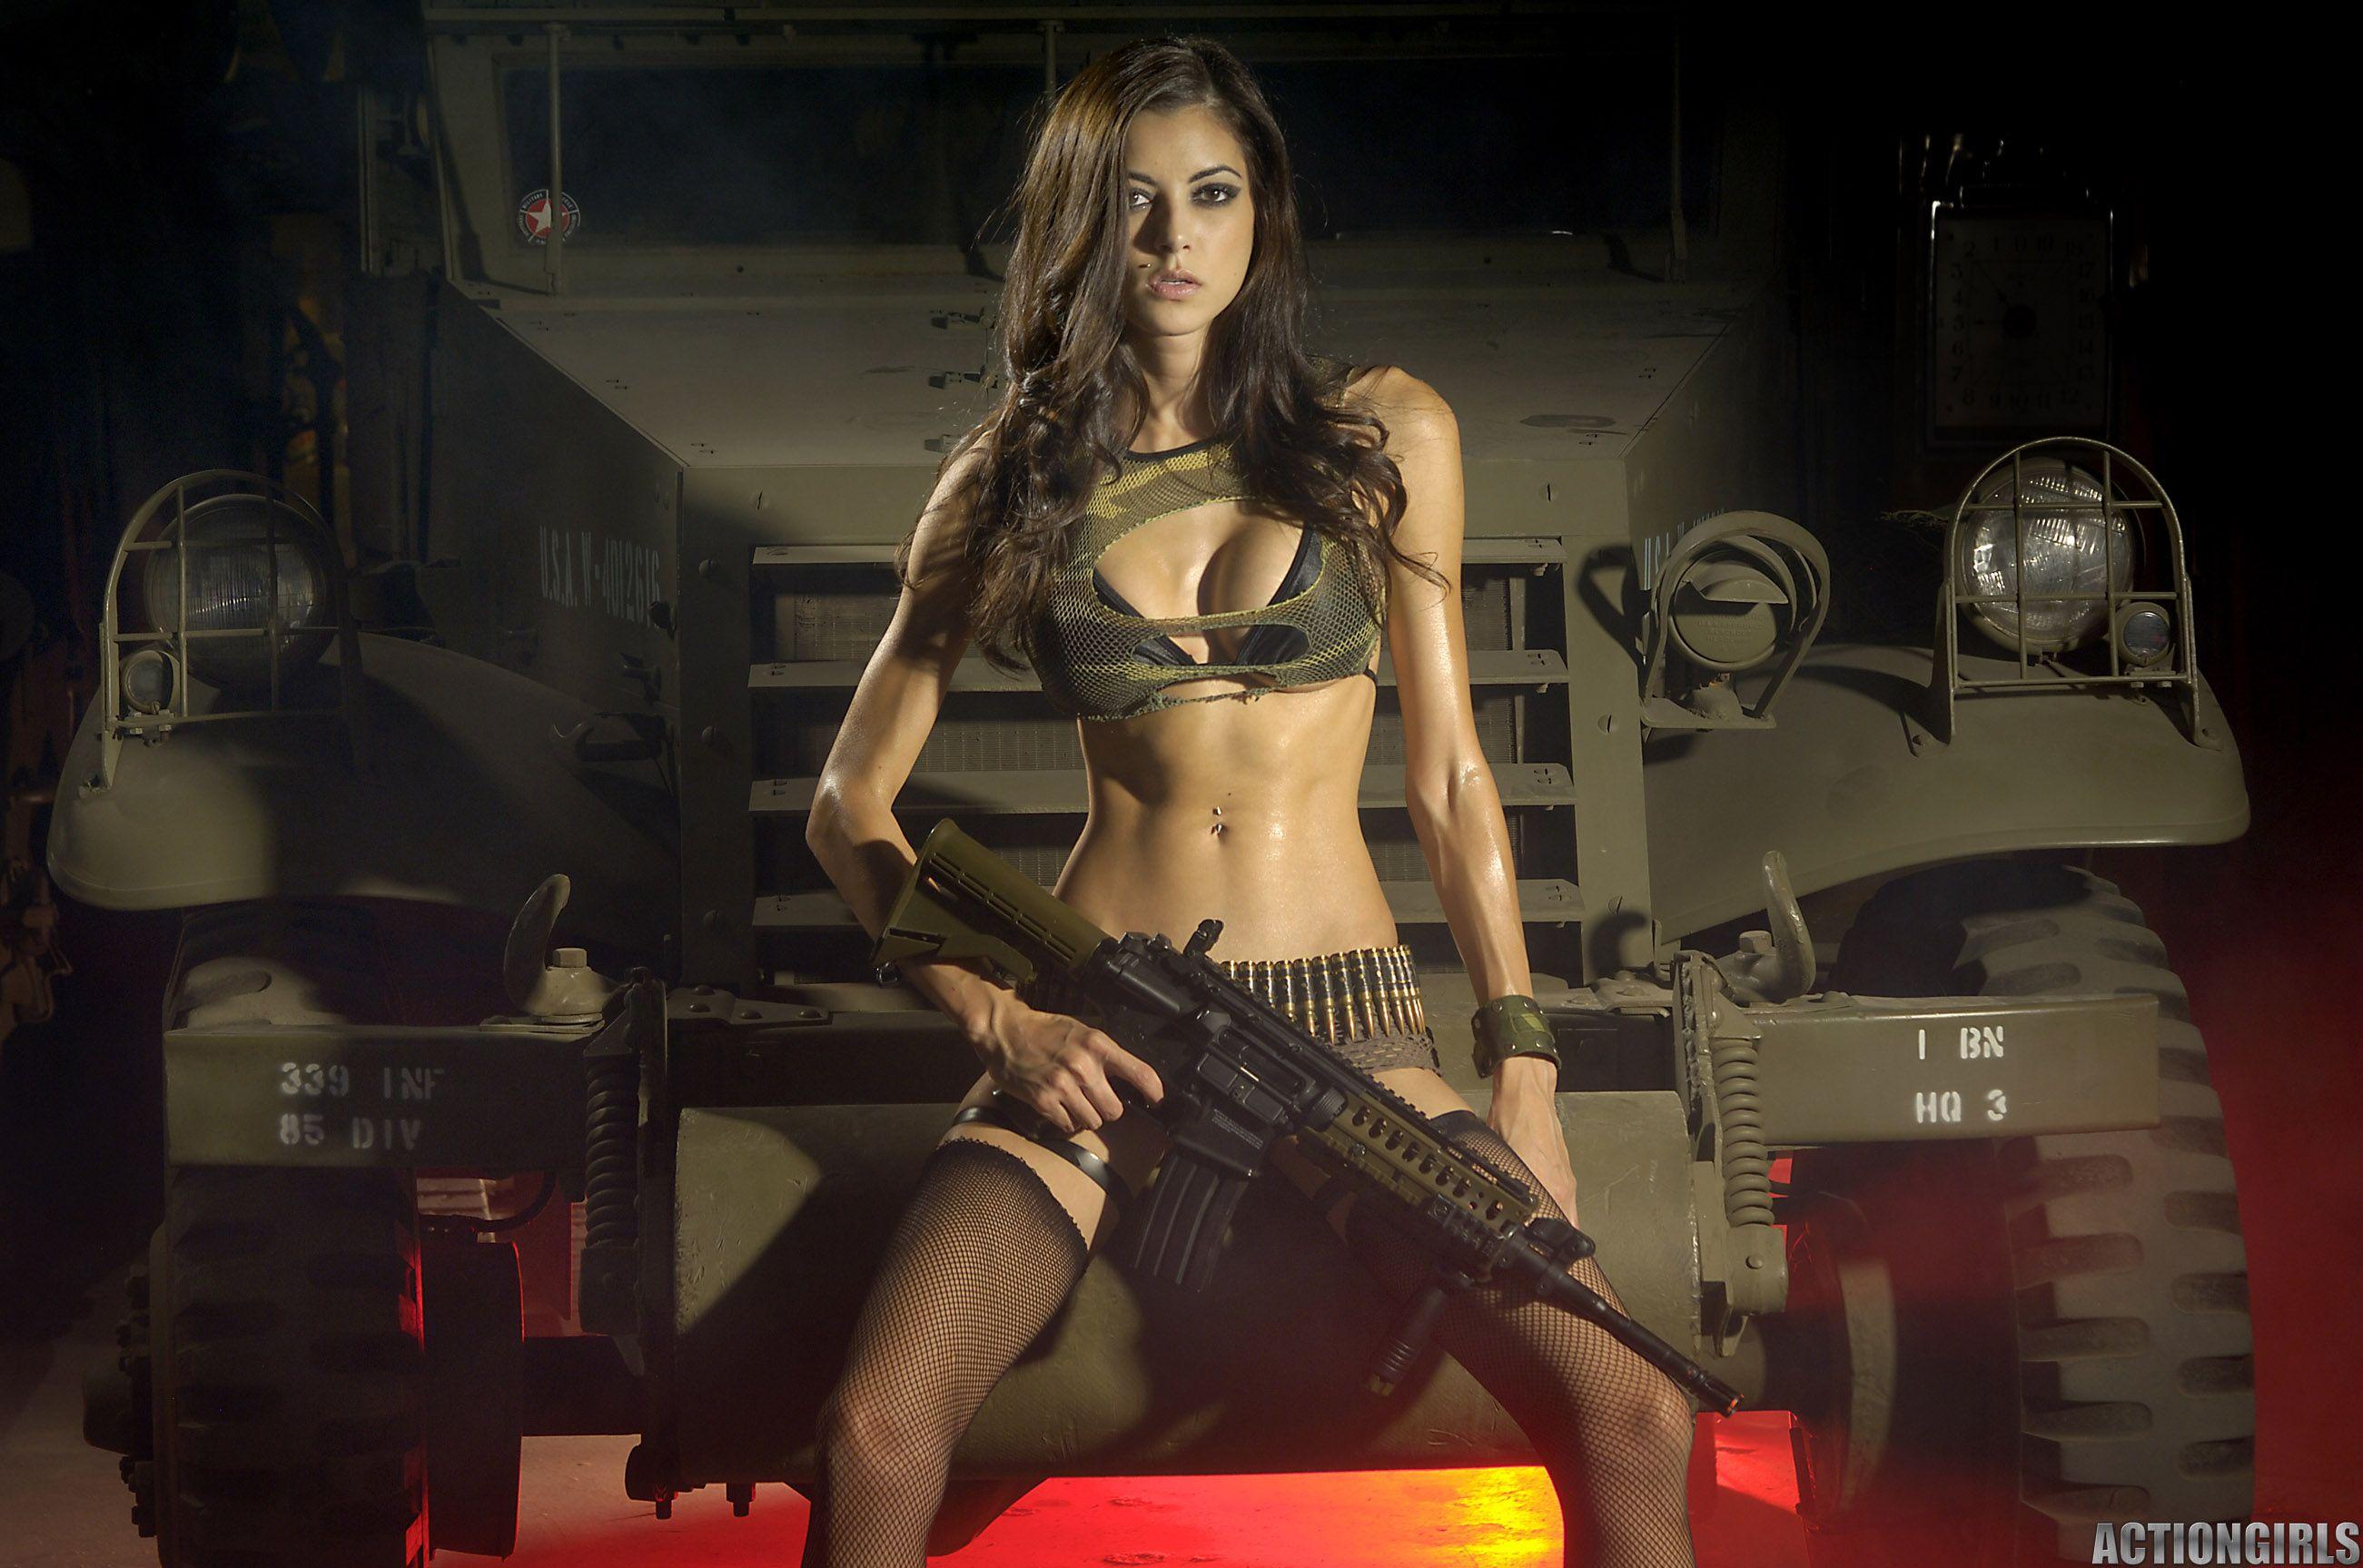 Секси девушки с оружием фото 3 фотография